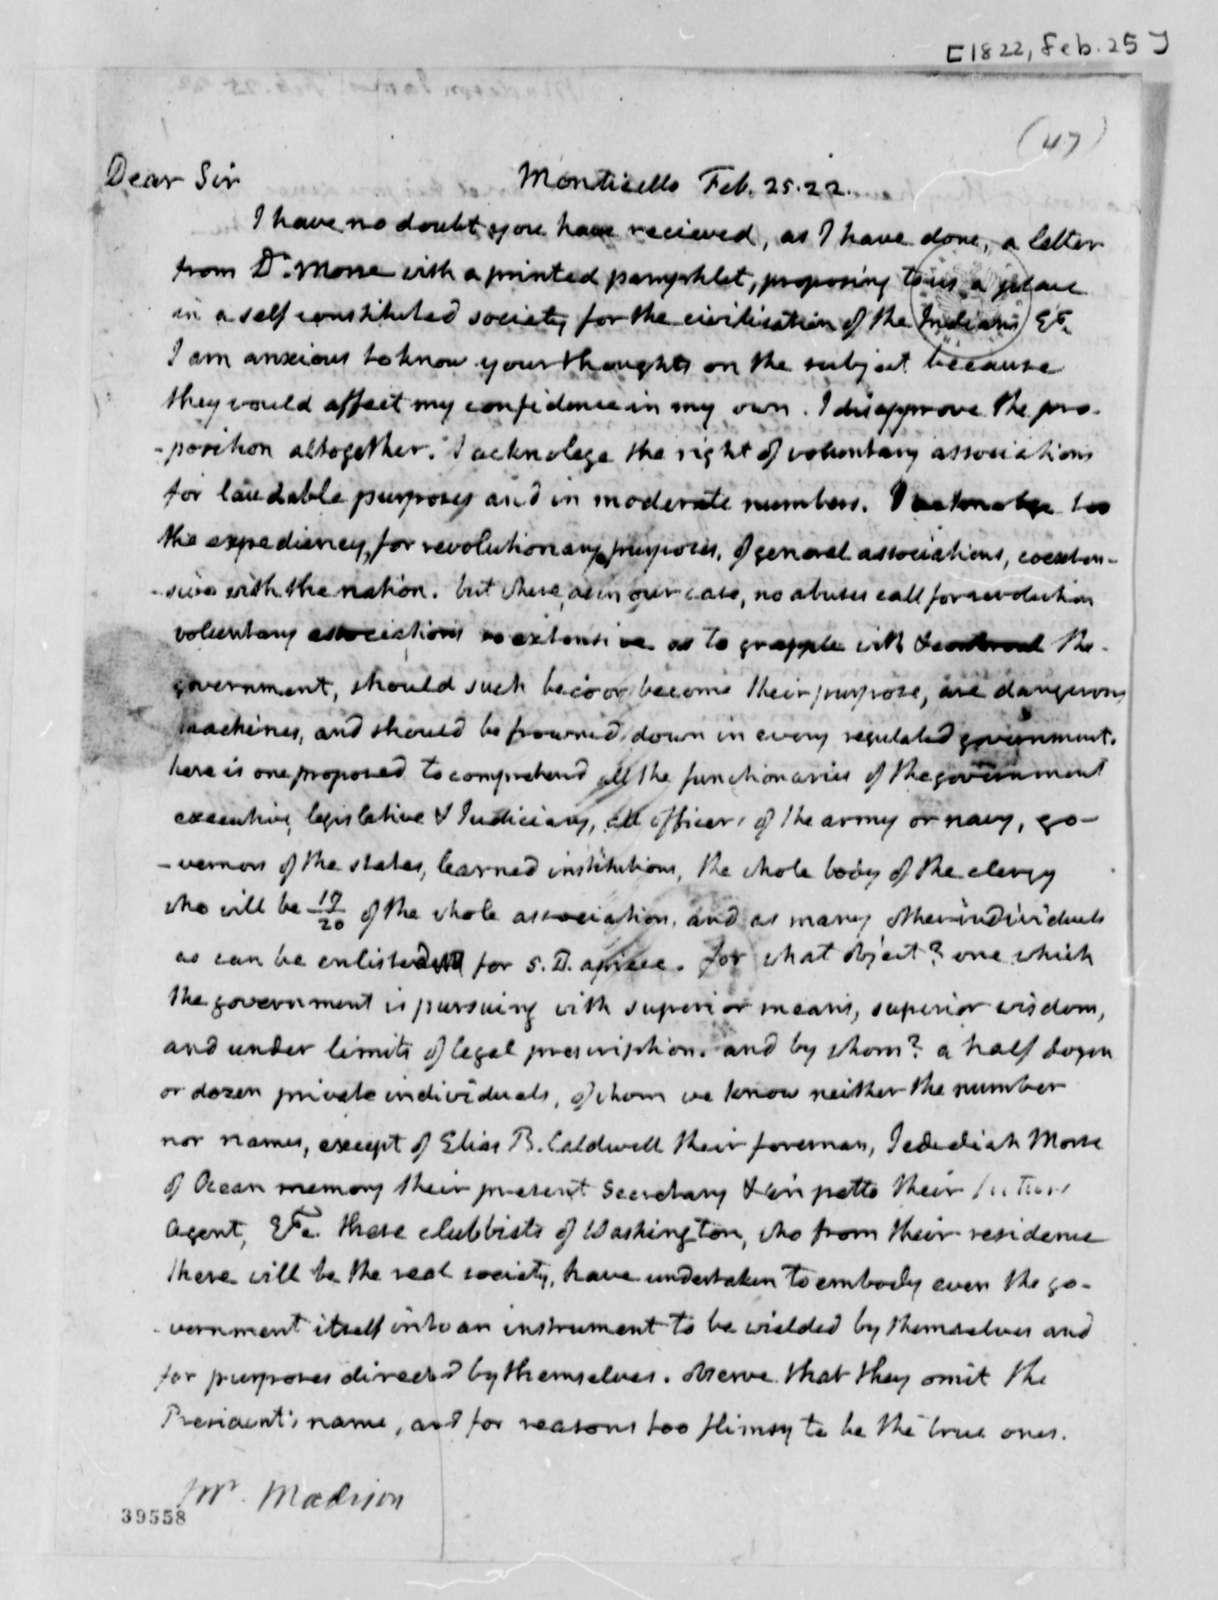 Thomas Jefferson to James Madison, February 25, 1822